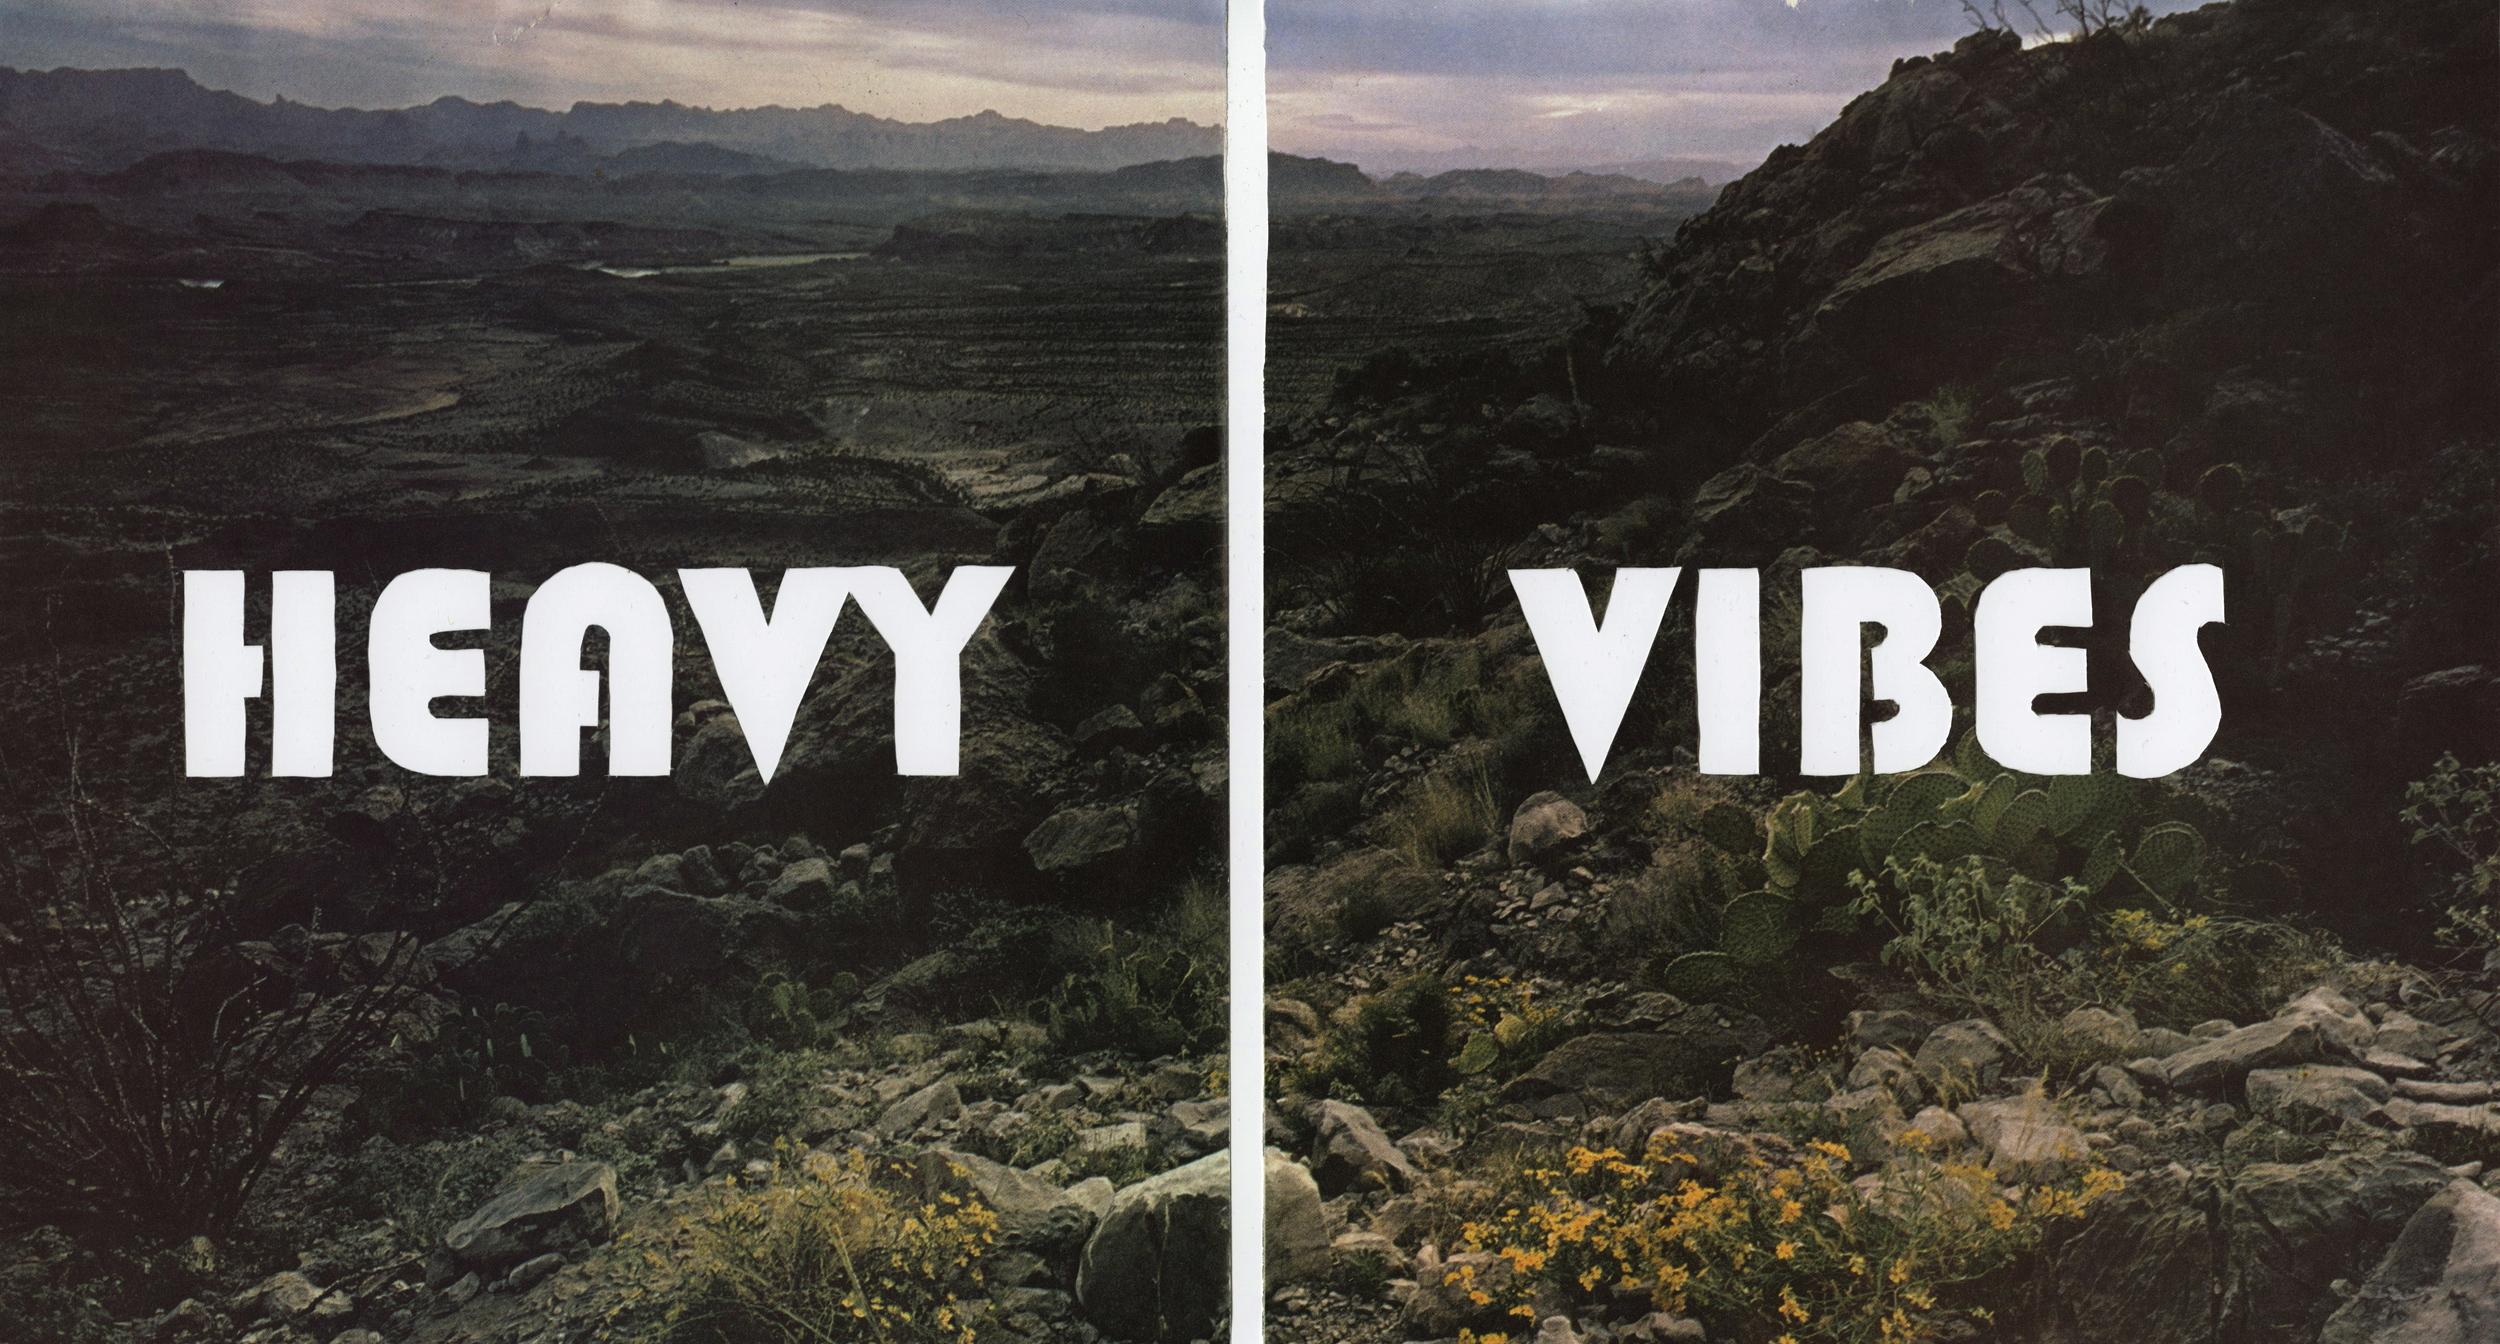 Heavy Vibes, 2013.jpg